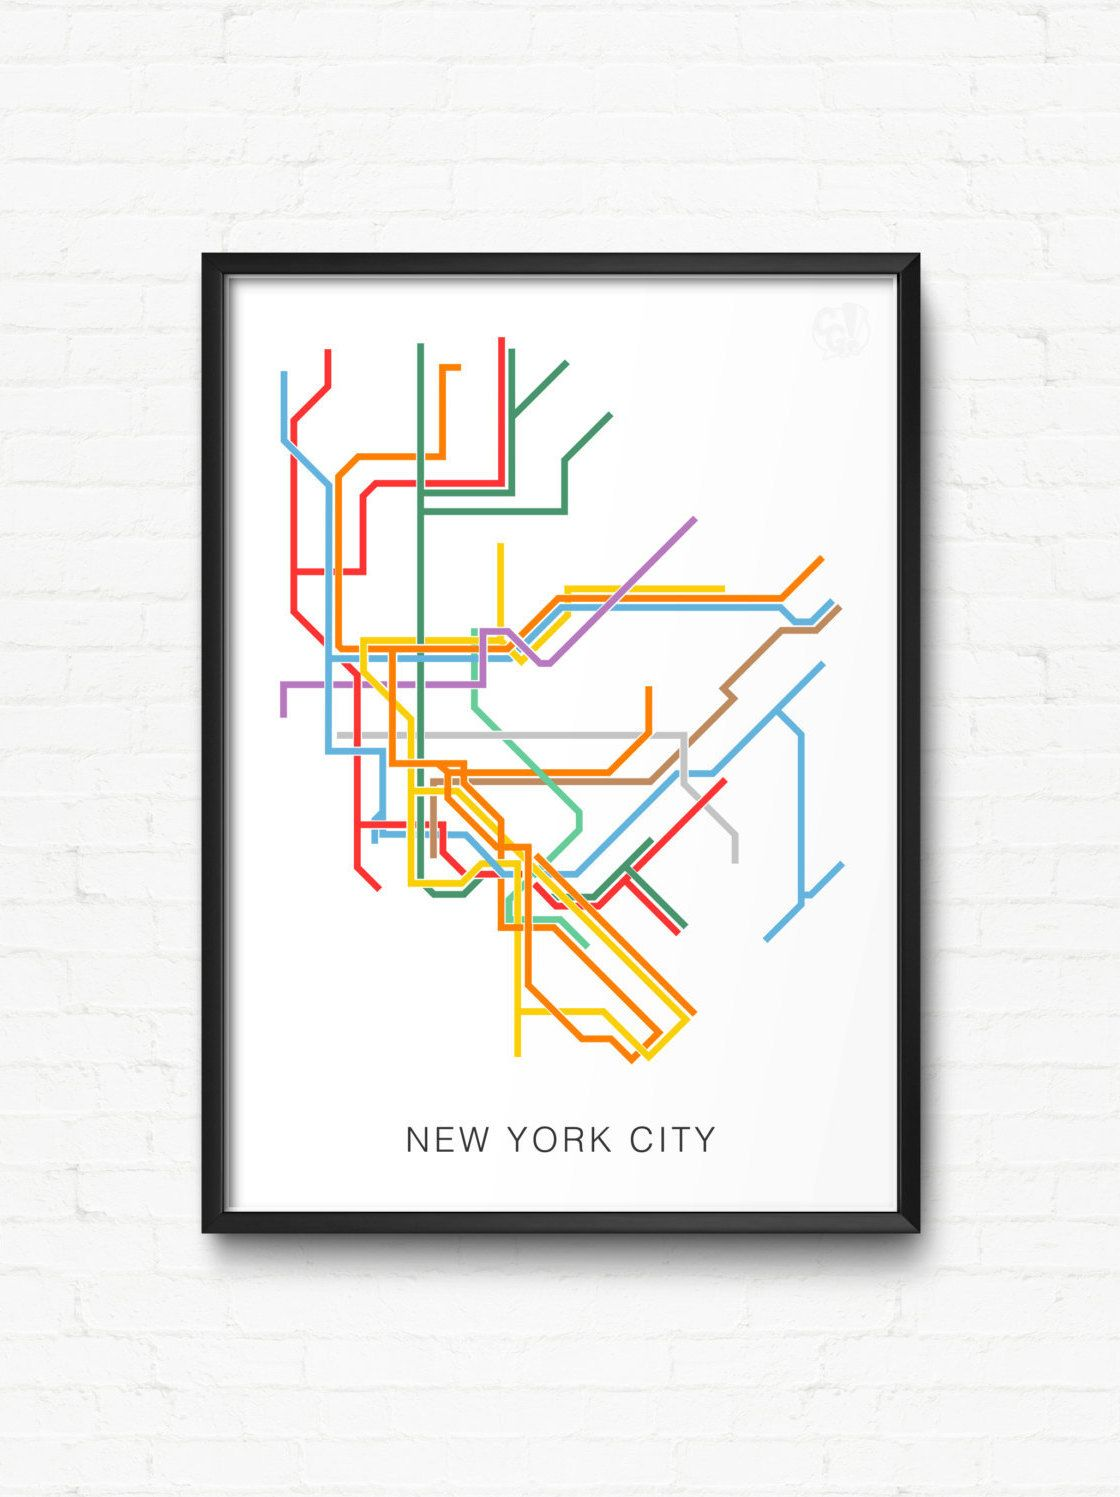 New York City Bus And Subway Map.New York City Print Of Nyc Subway Map City Transit Map Poster Nyc